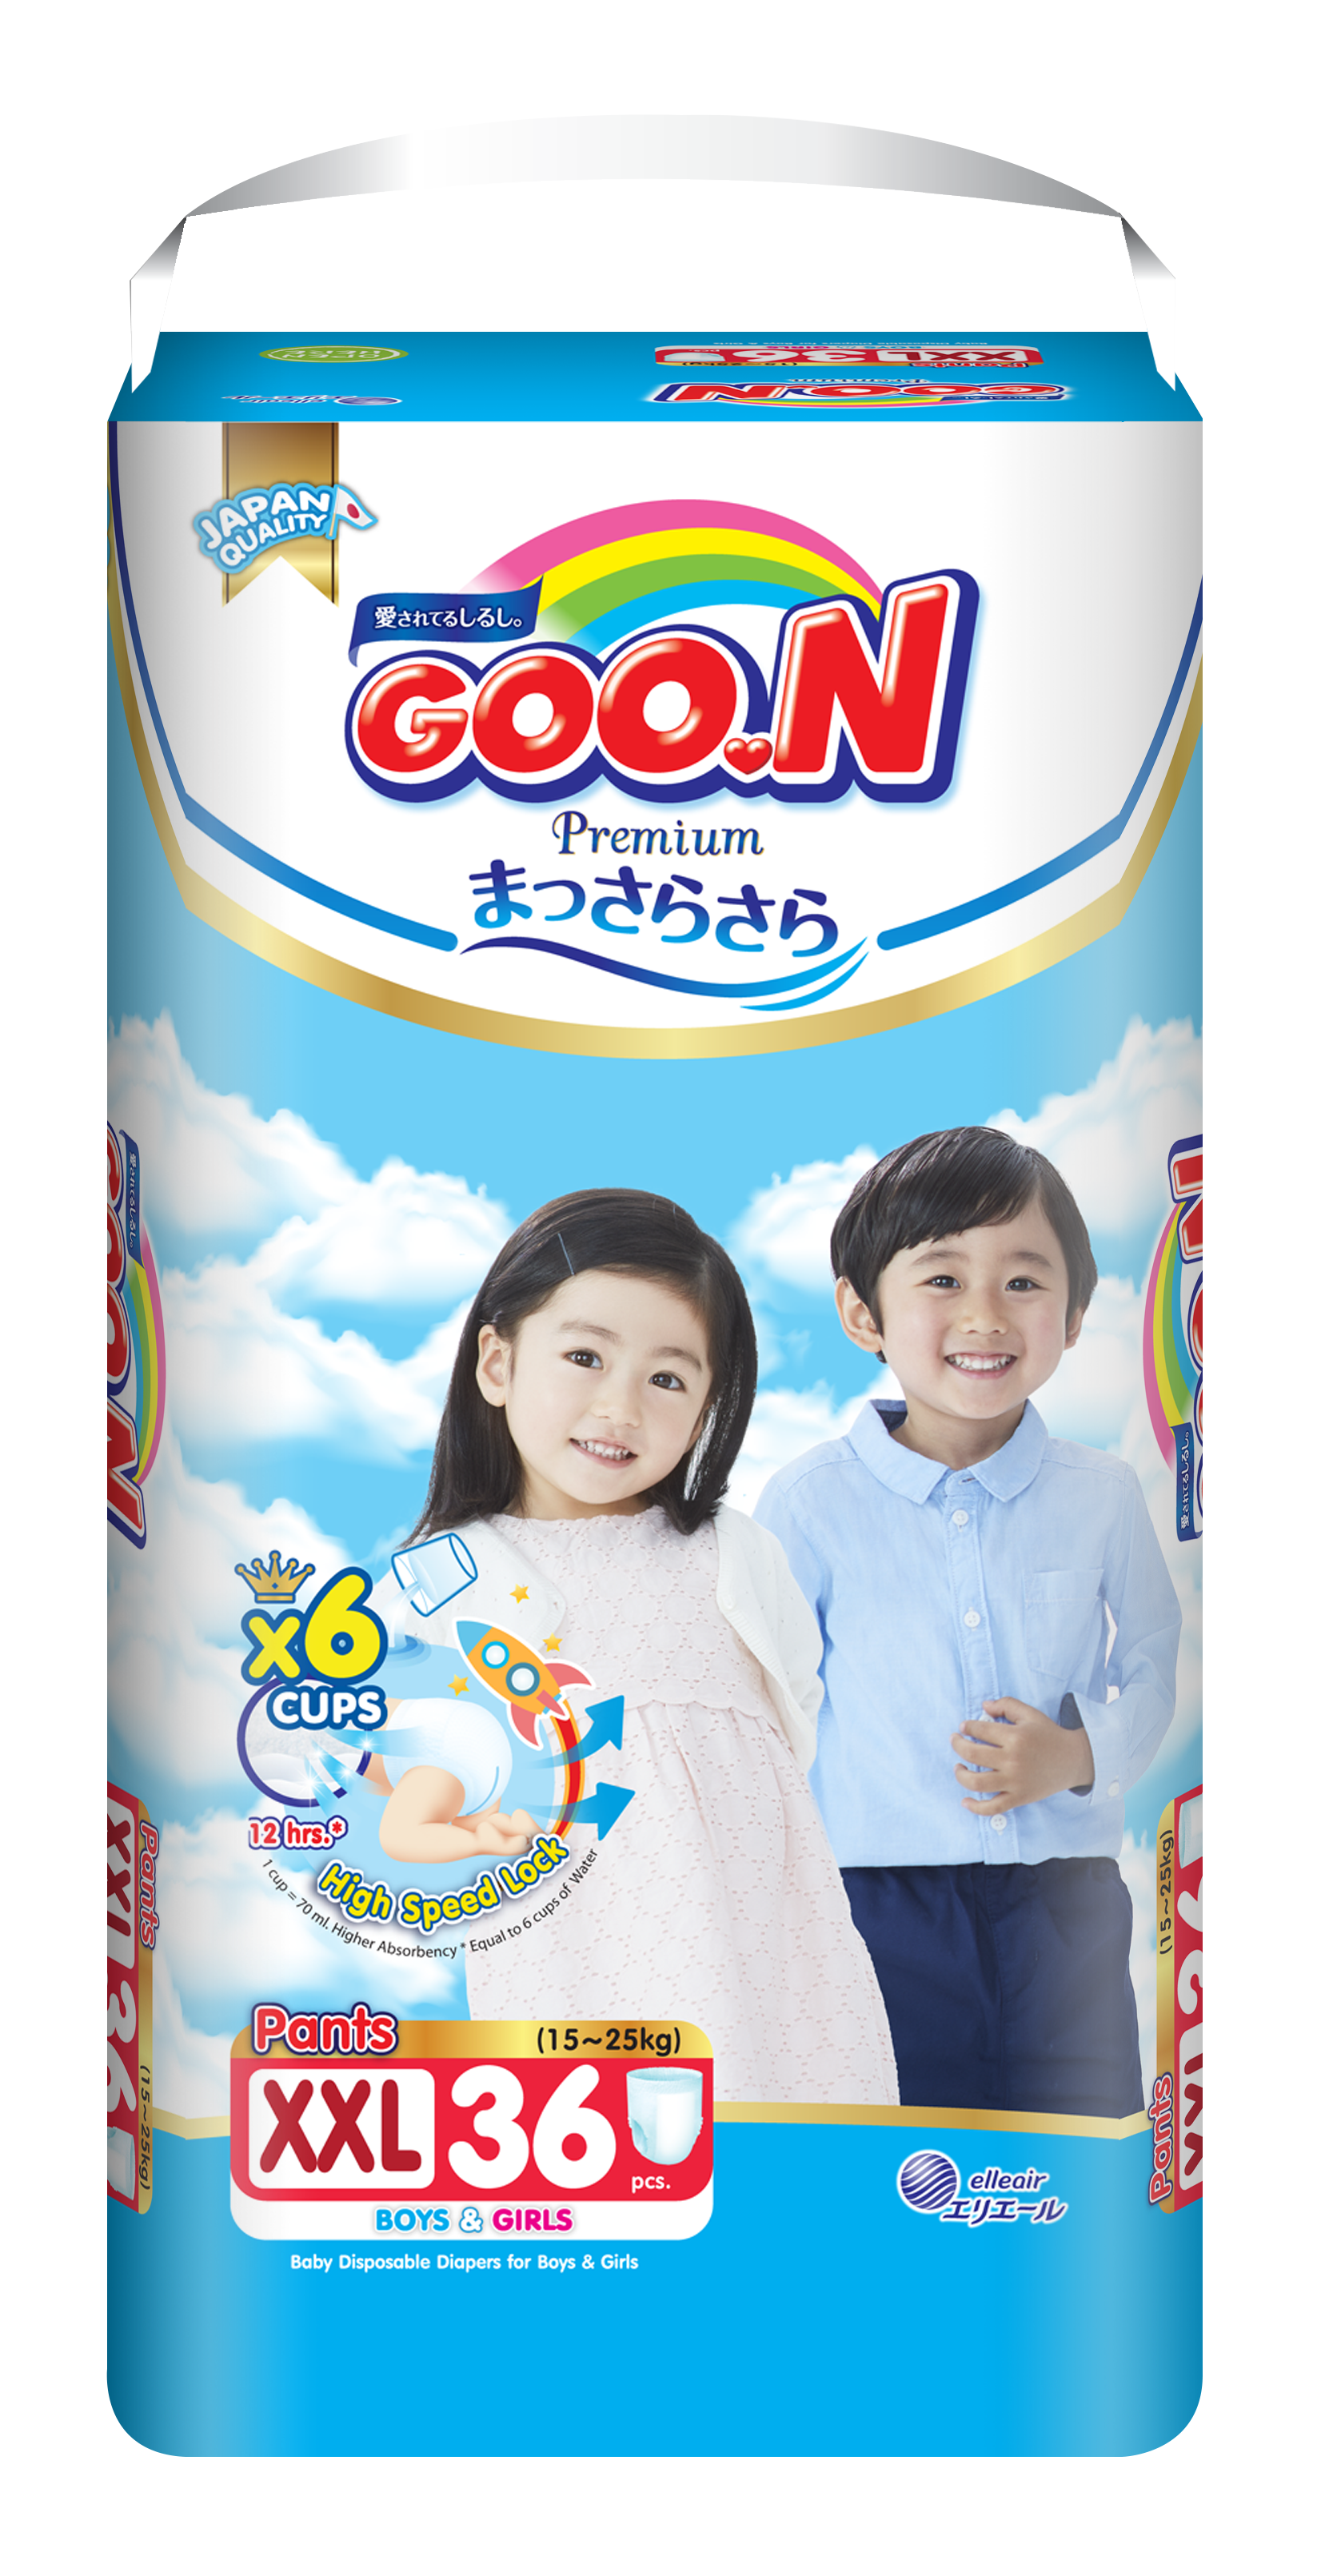 Tã quần Goon Premium size XXL 36 miếng